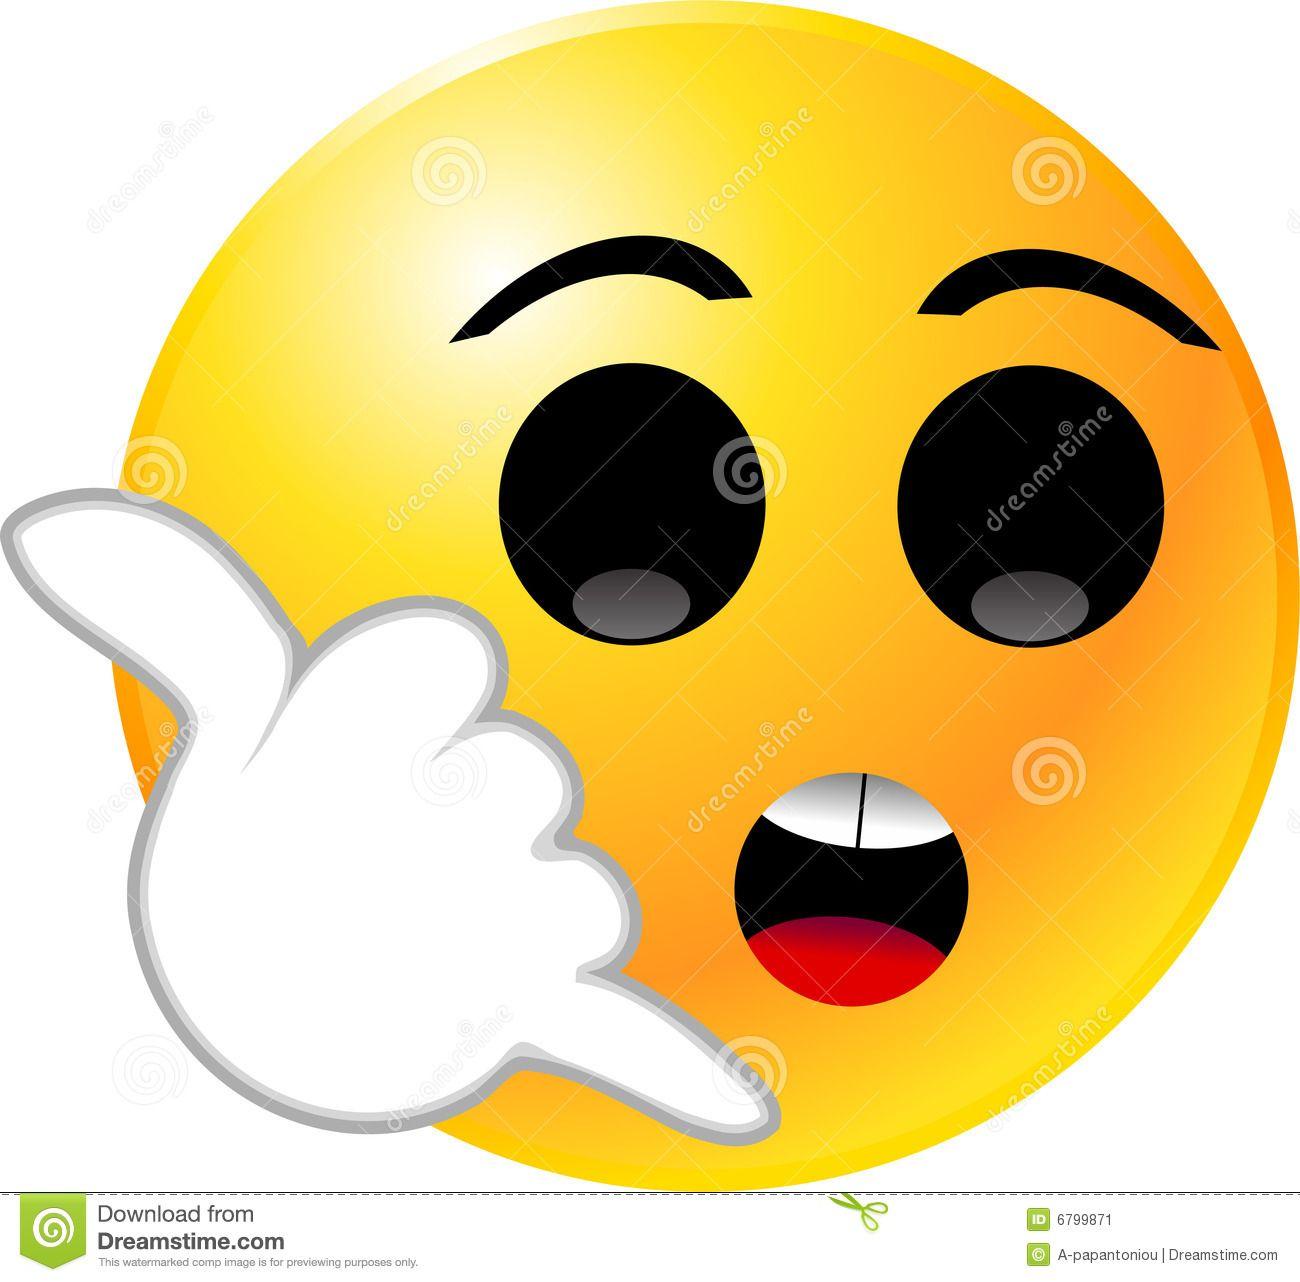 smiley face emotions clip art smiley face clip art emotions rh pinterest com  free smiley face emotions clip art